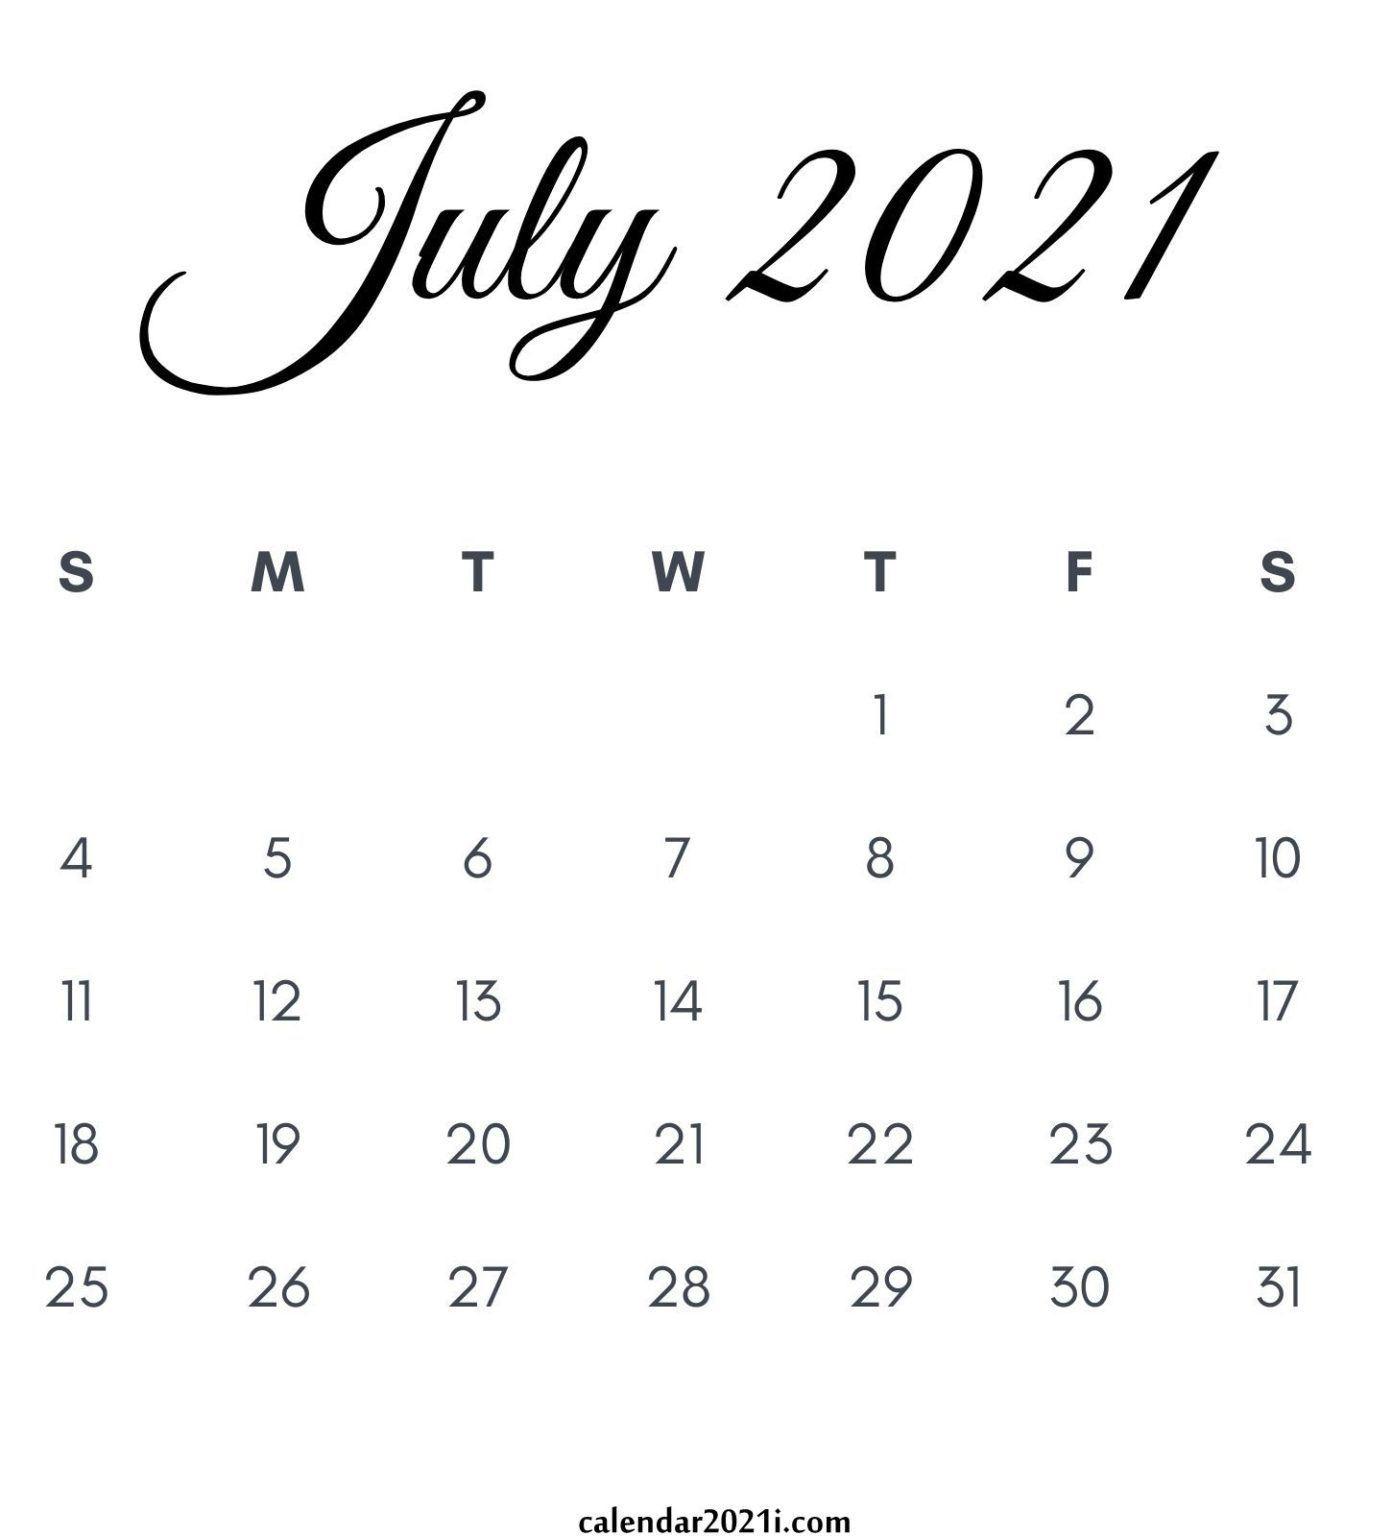 July 2021 Calendar Printable In 2020 | Monthly Calendar